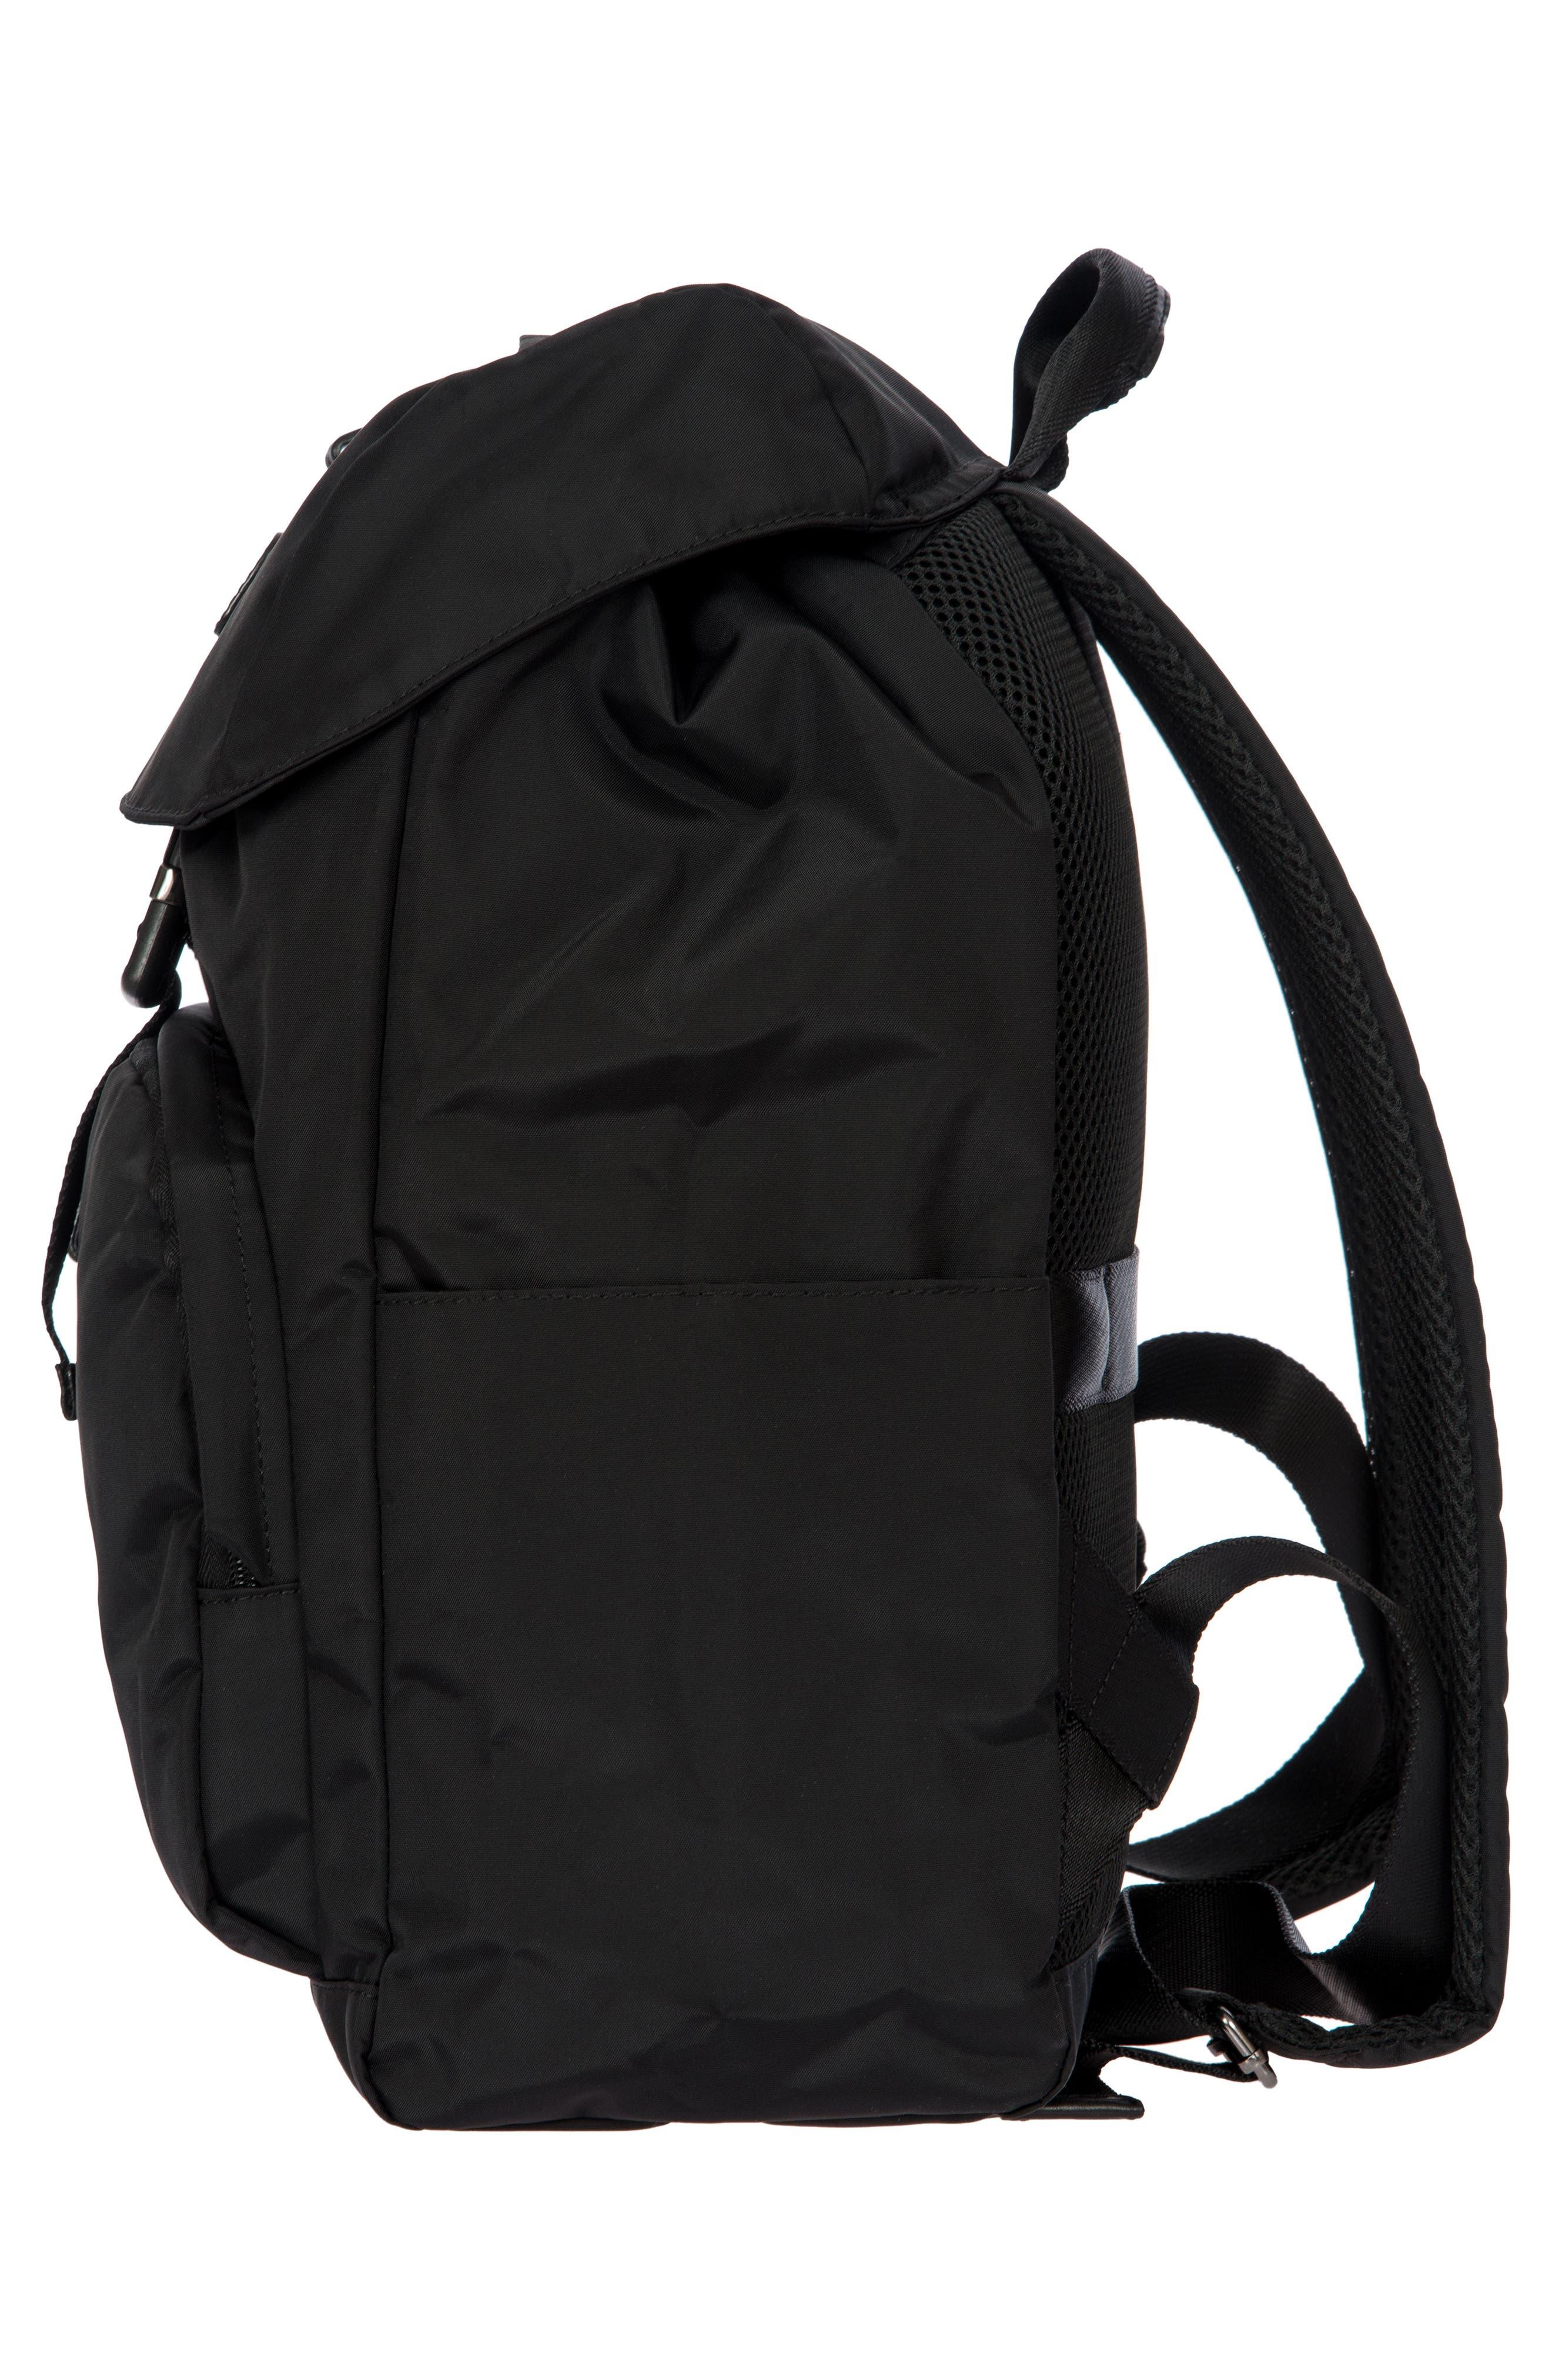 X-Bag Travel Excursion Backpack,                             Alternate thumbnail 4, color,                             BLACK/ BLACK